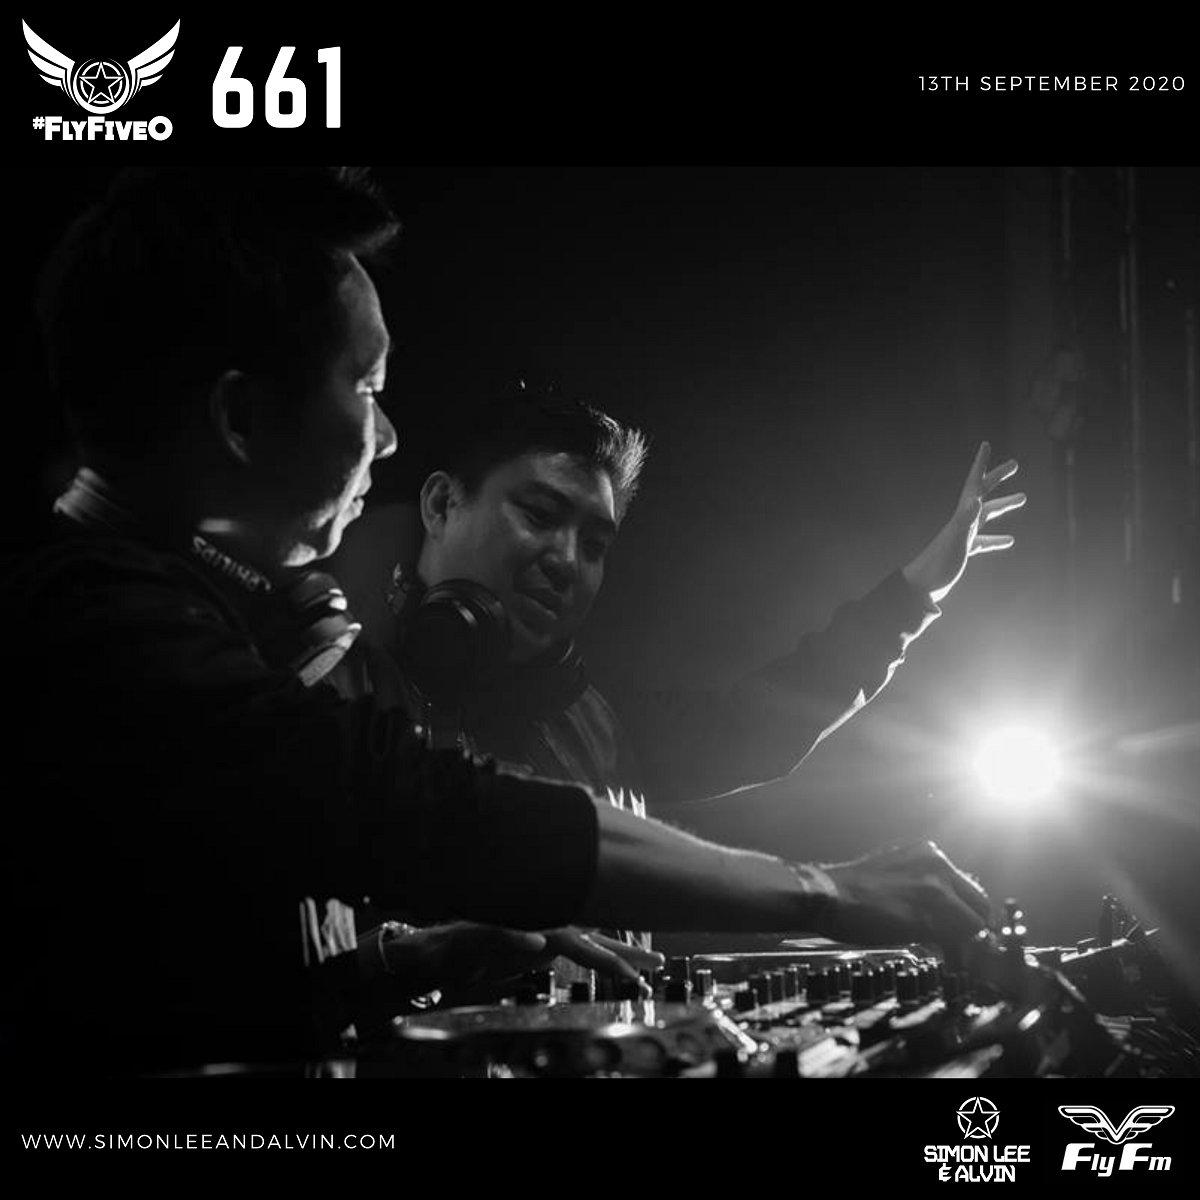 [TONIGHT - 12AM - LIVE] All new episode FLY FM #FlyFiveO #661 feat new releases from @AhmedHelmyMusic @marlo_music @DarrenPorterUK @borisfoongdj @husmanmusic @rubikoutbound + many more! https://t.co/oPRDvifKvq